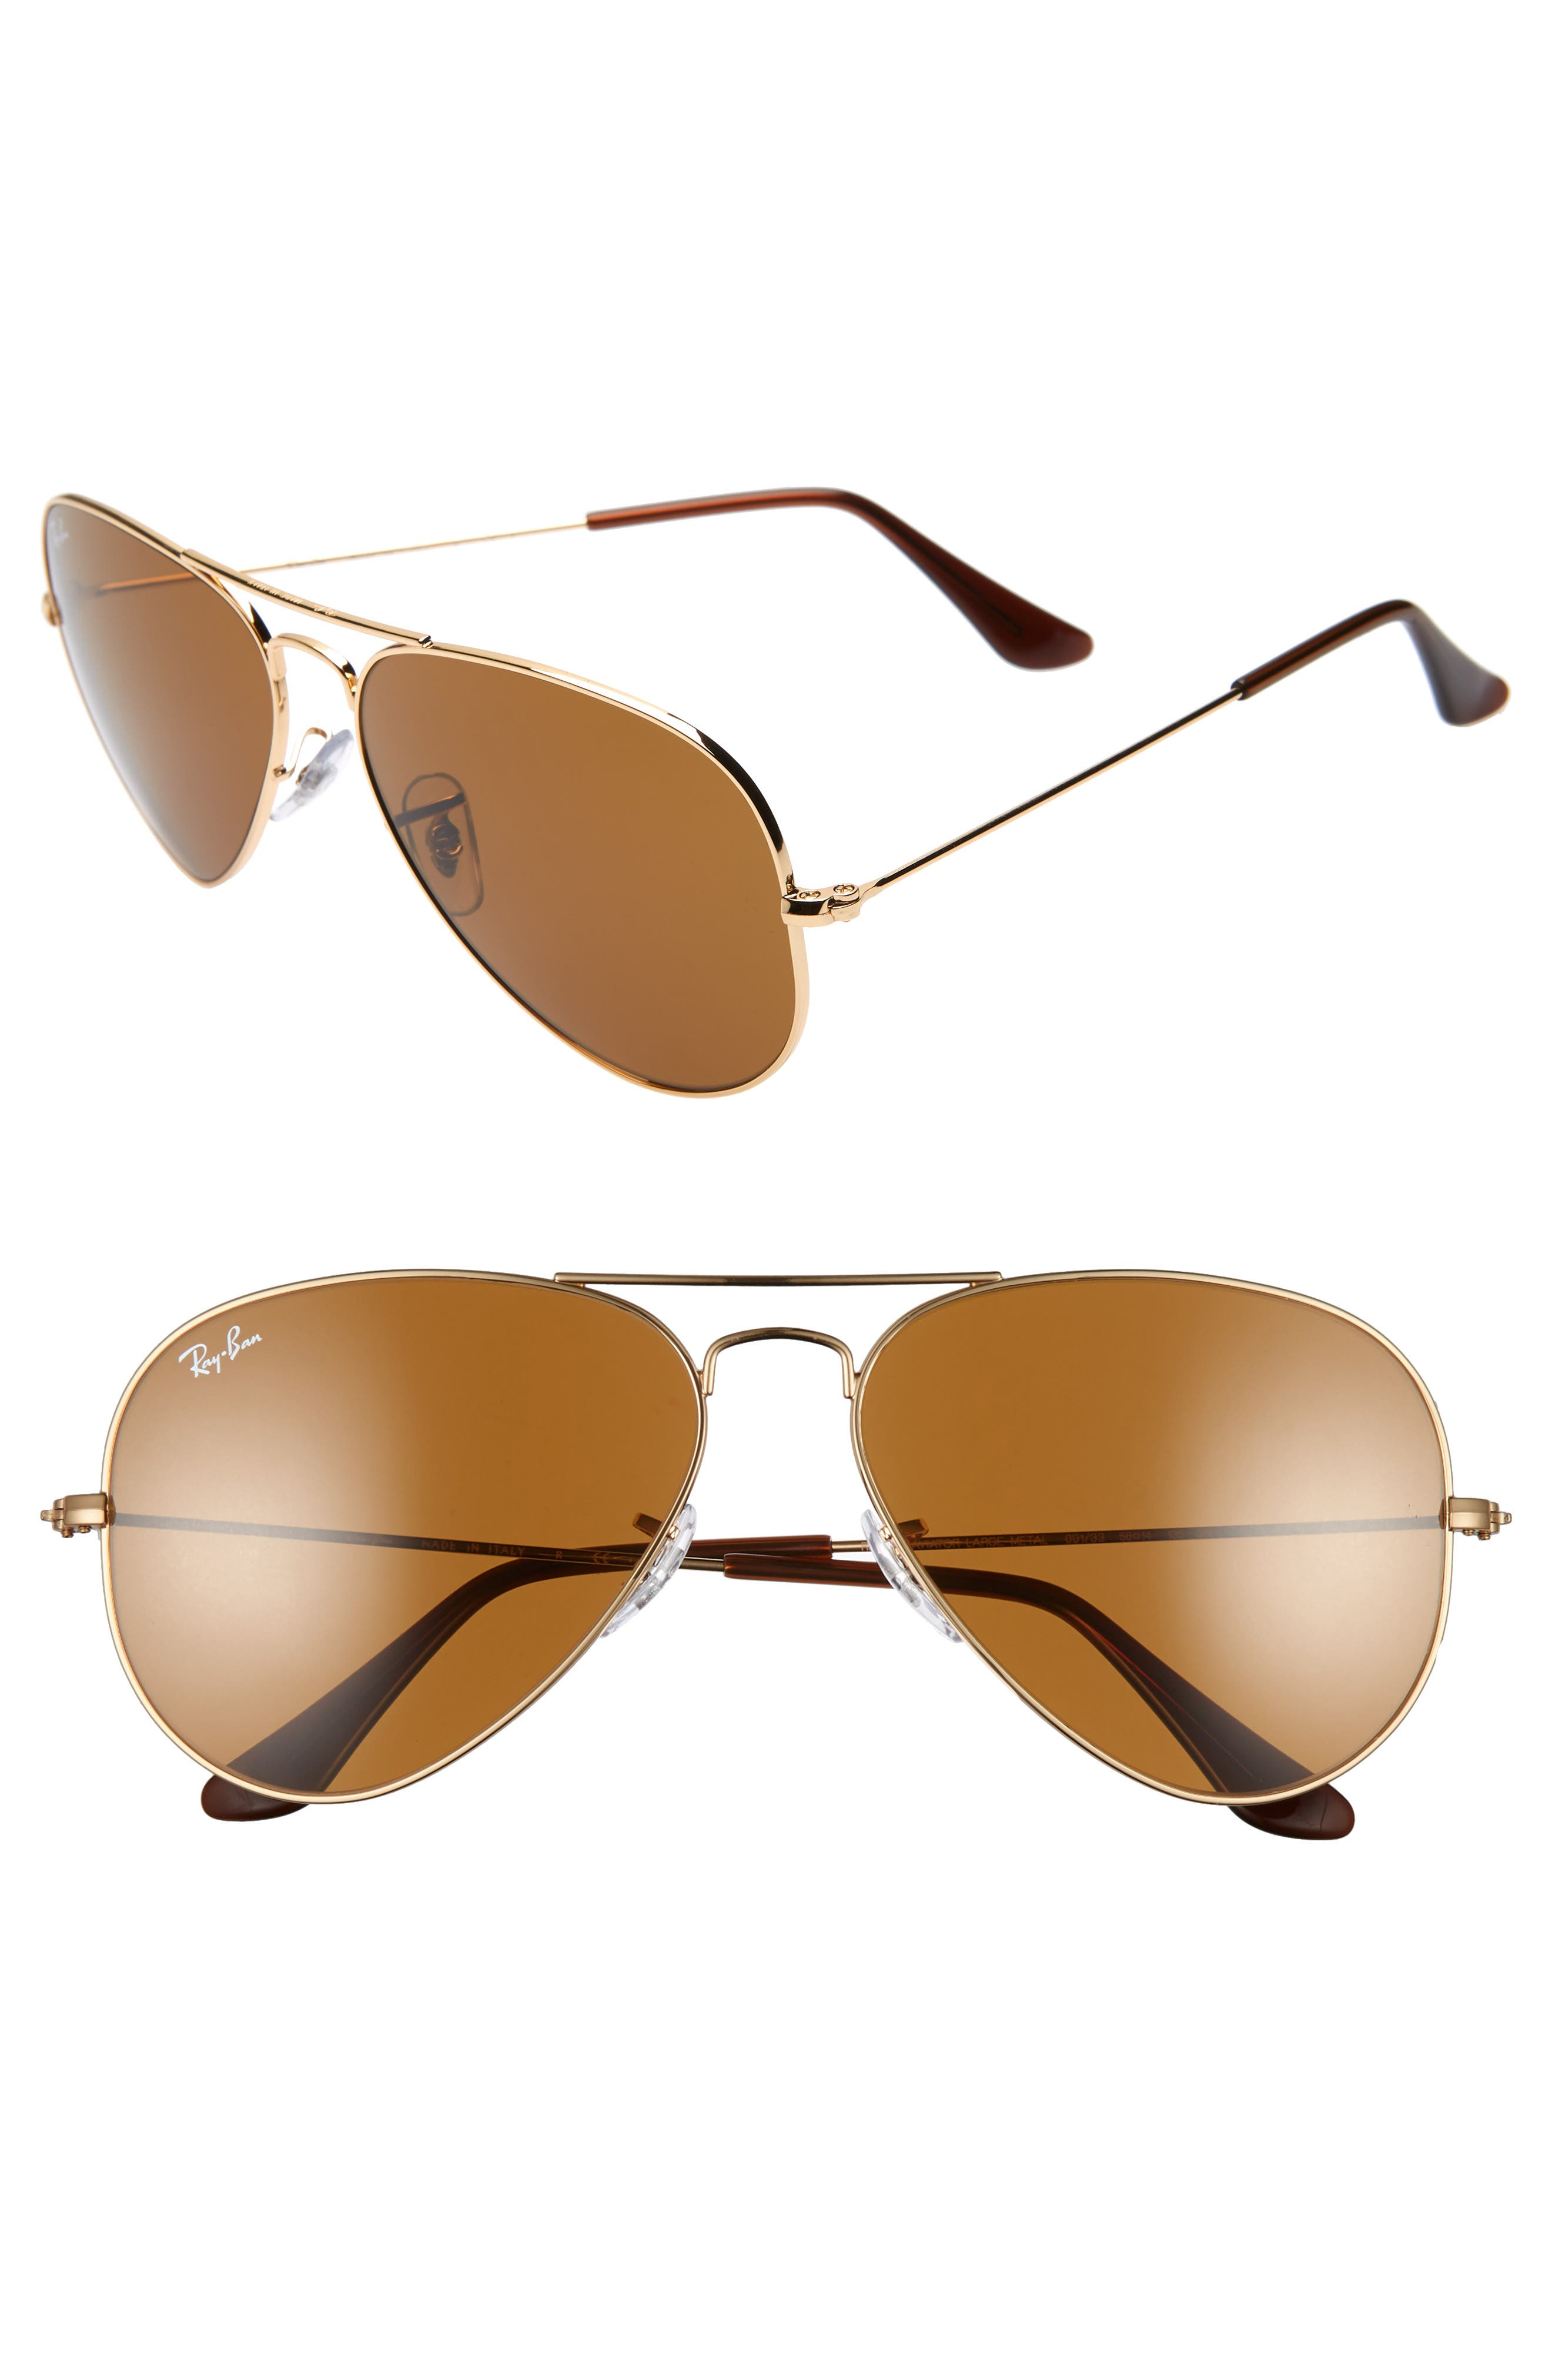 Ray-Ban Standard Original 5m Aviator Sunglasses - Gold/ Brown Solid